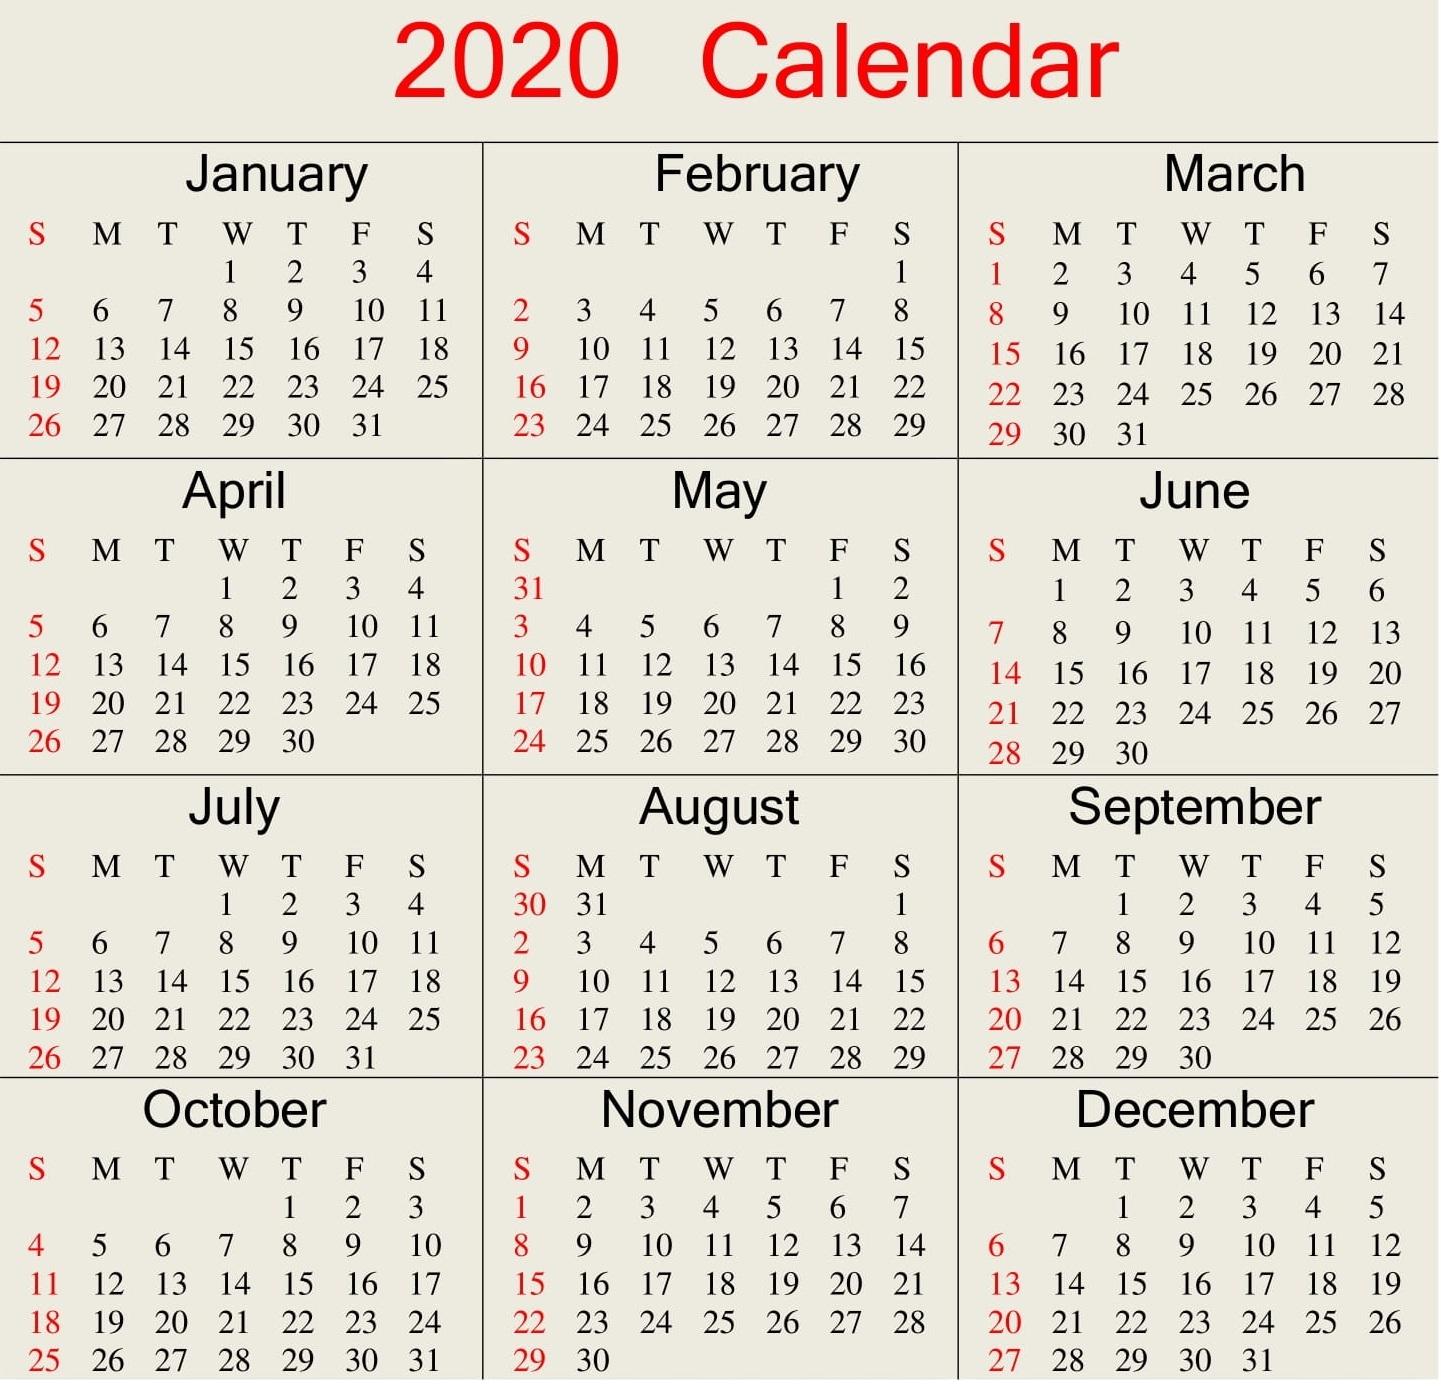 Julian Date Calendar 2020 In Excel   Free Printable Calendar